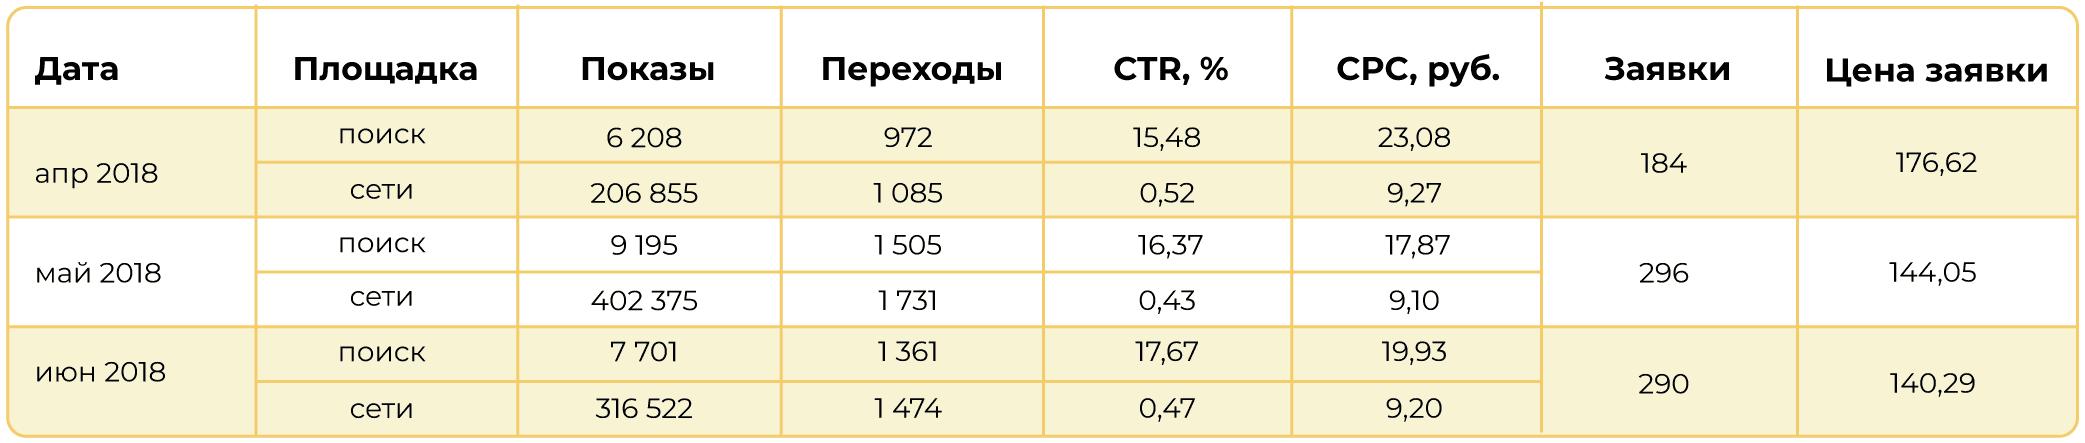 Результаты Яндекс.Директ за 2018 год